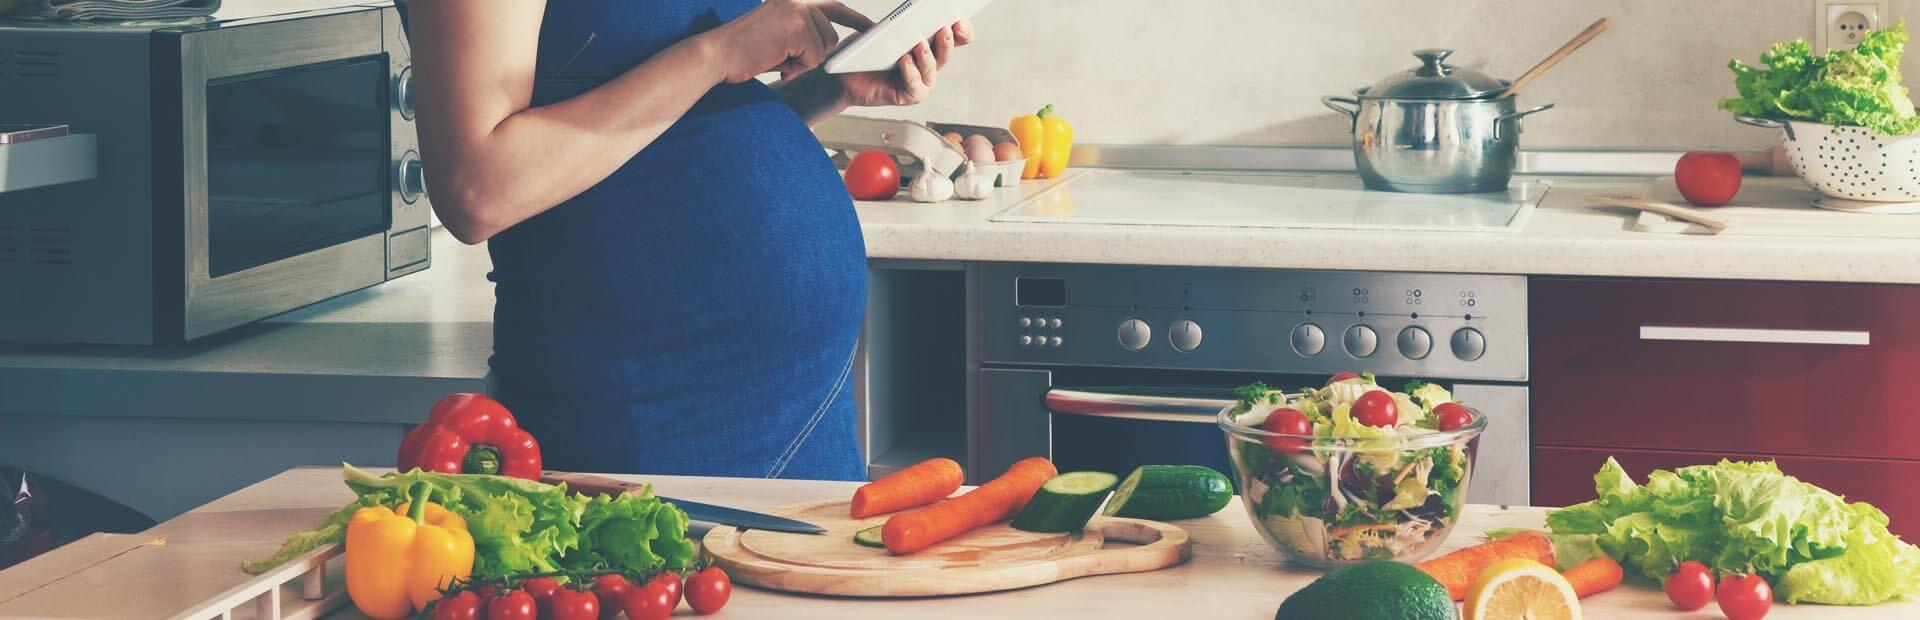 Pregnant women eating